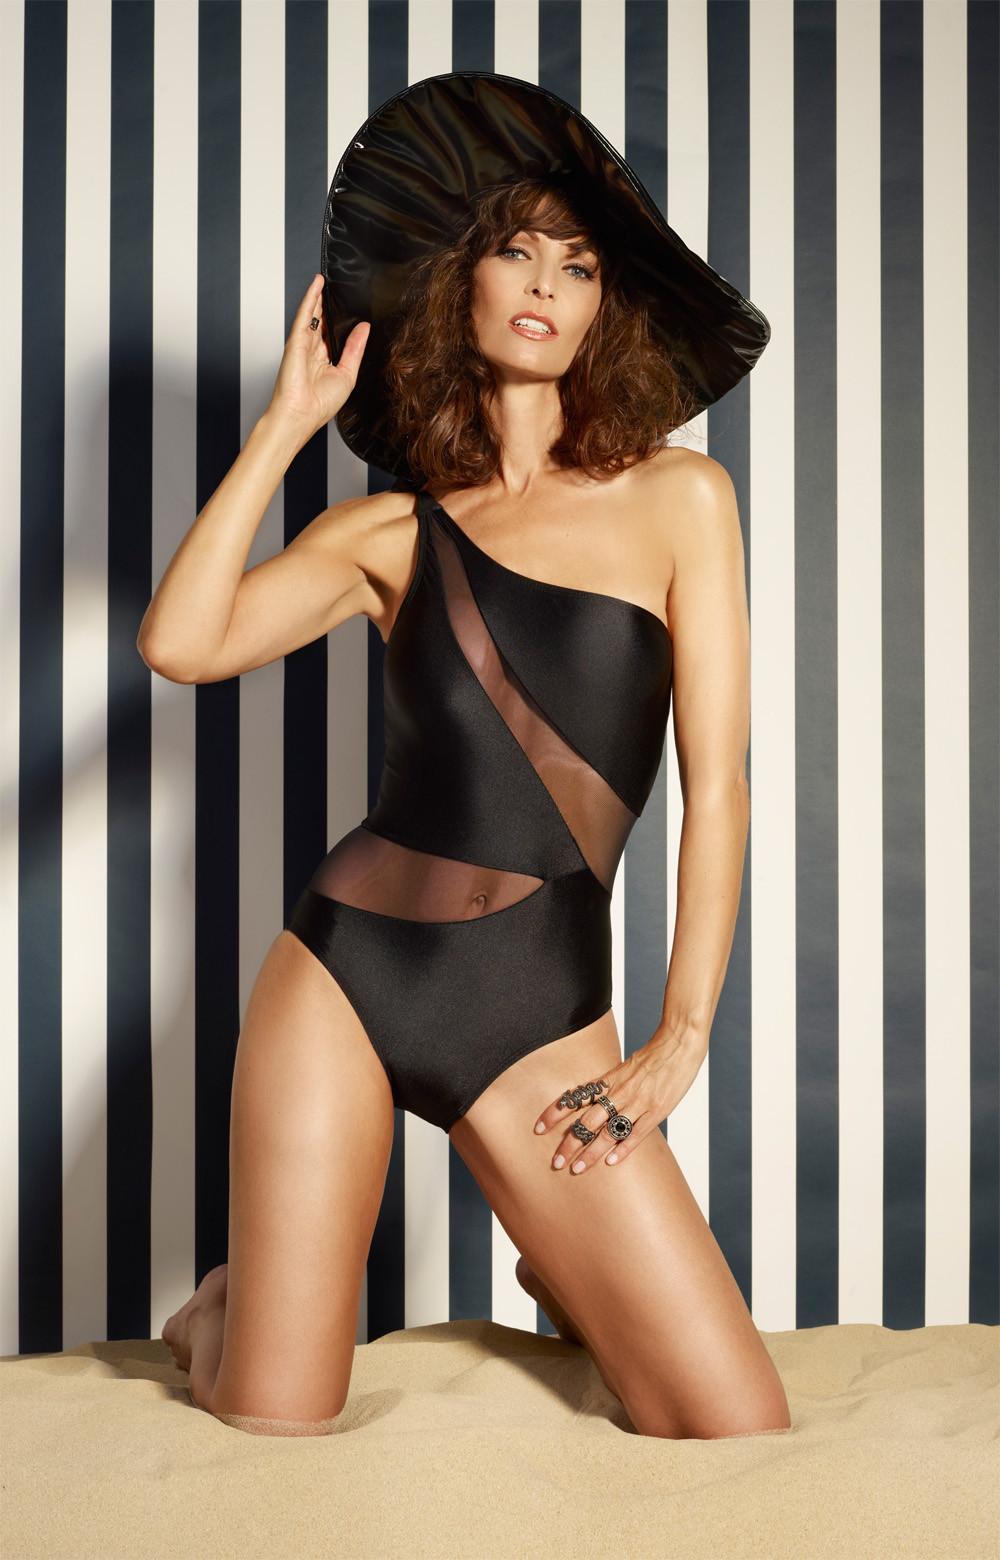 Damen Bademode - Badeanzug Swimsuit black - S1234